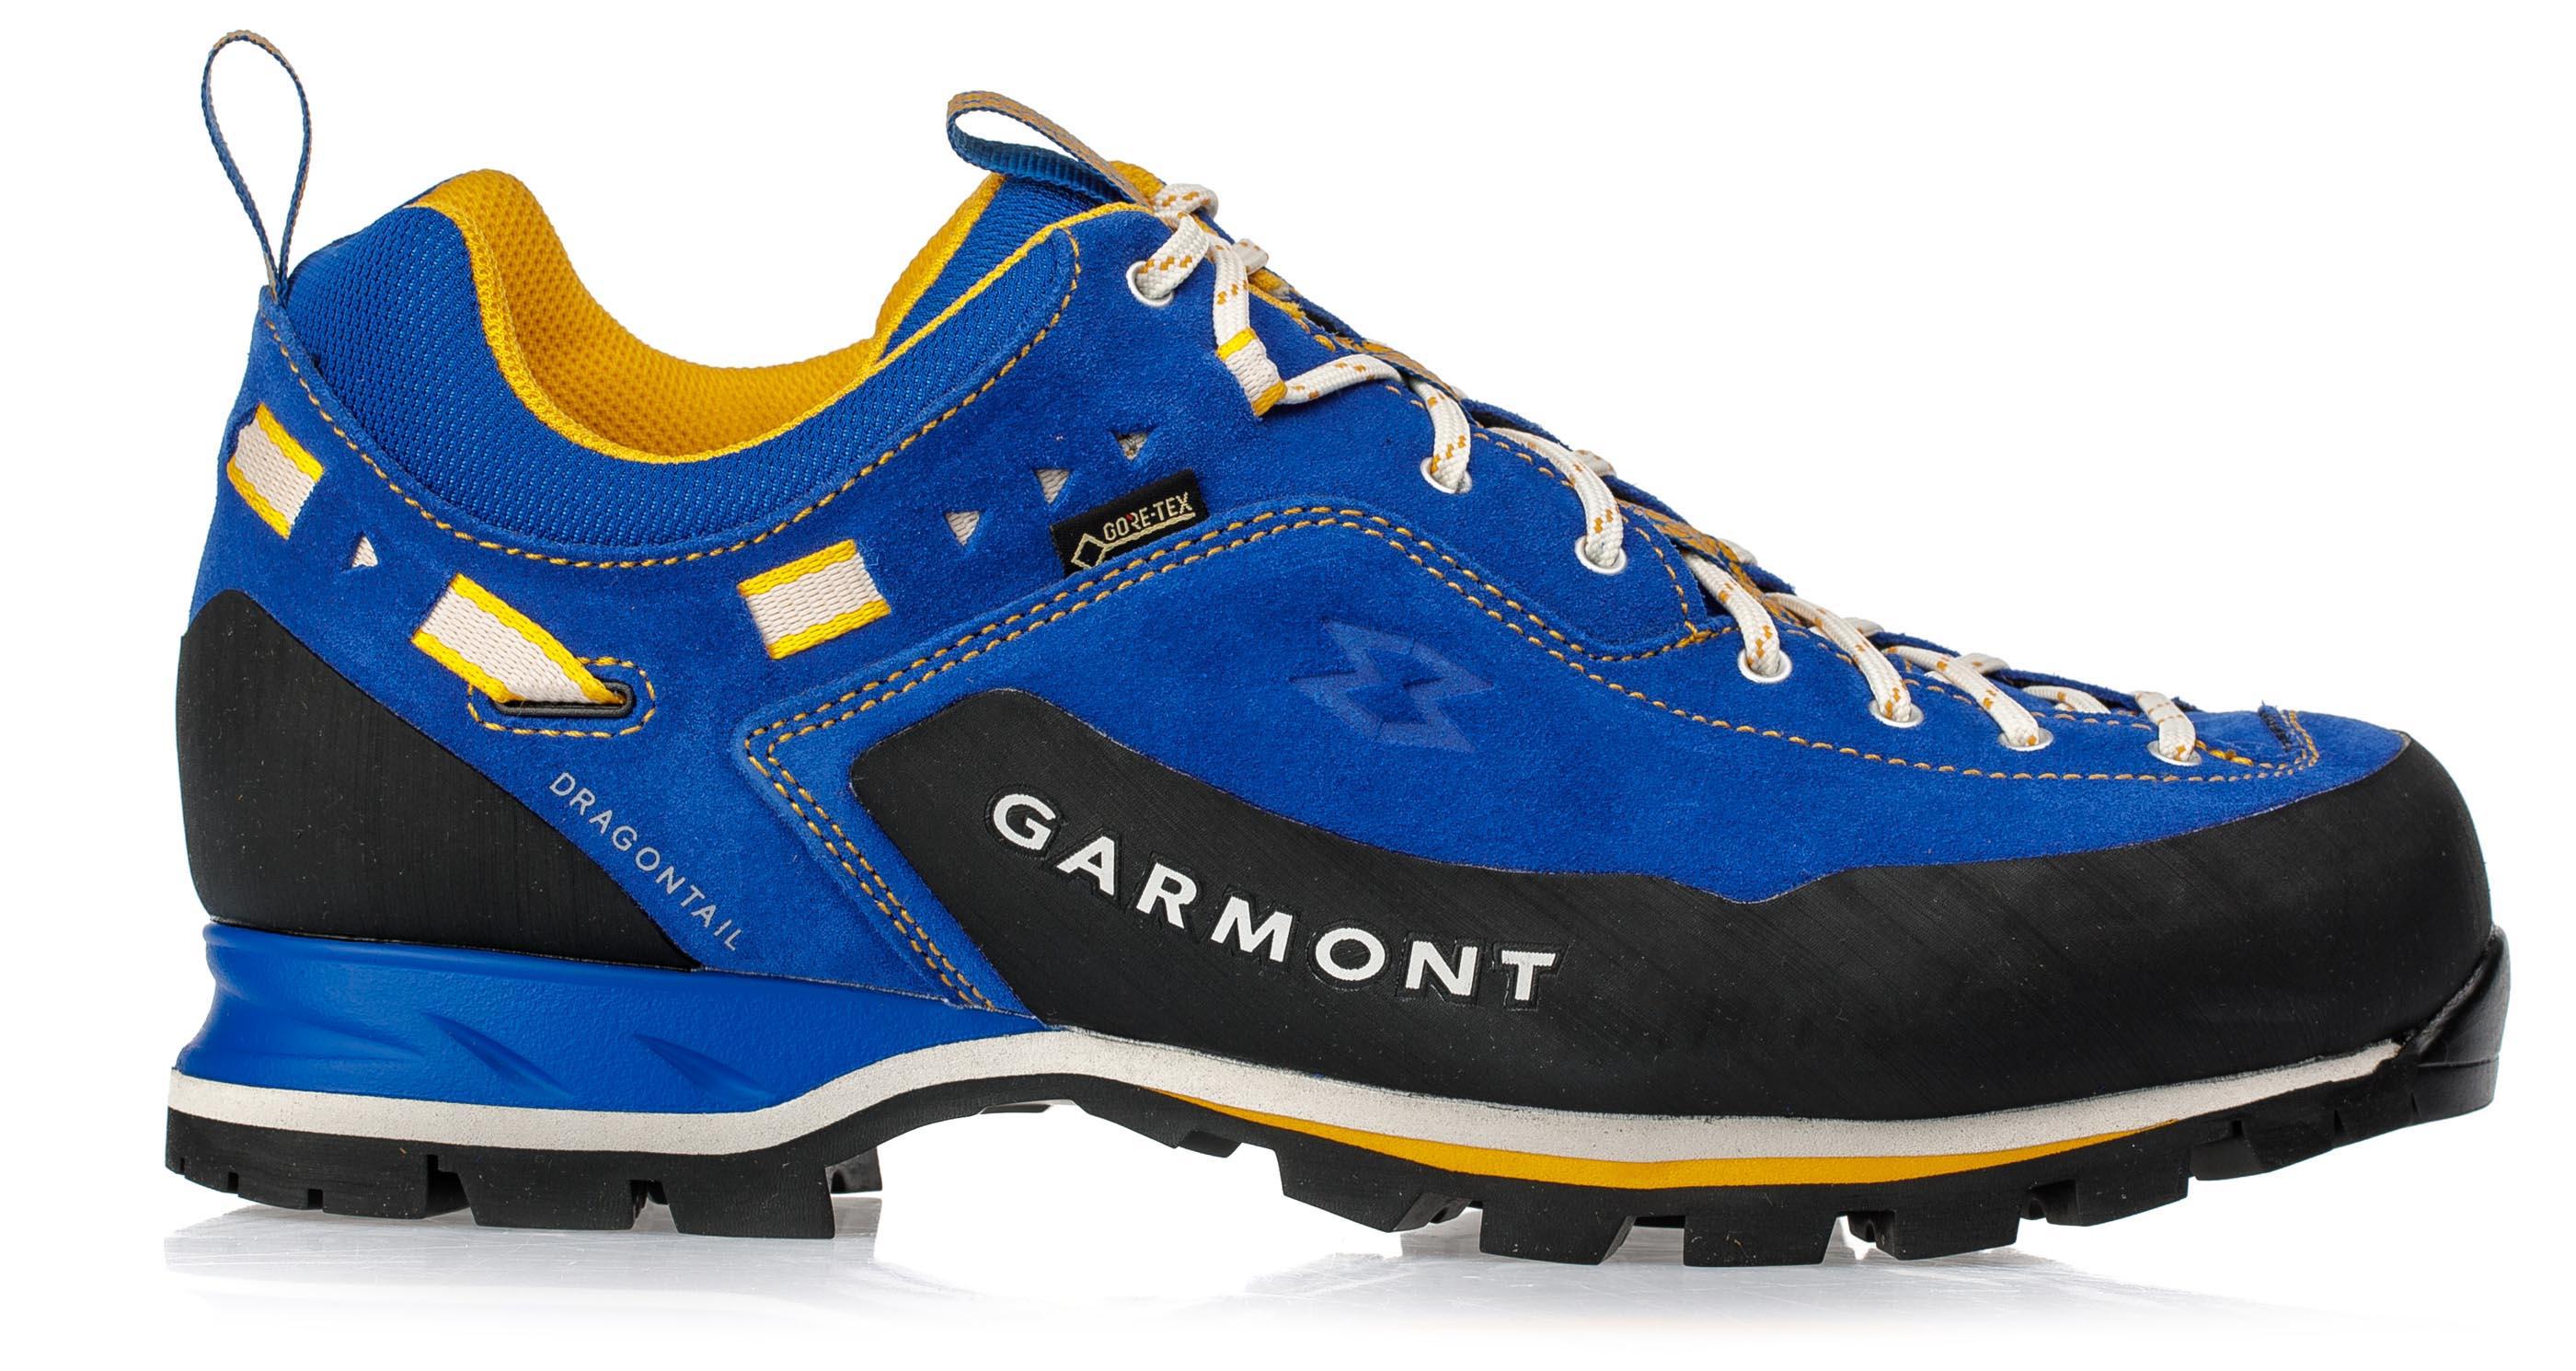 Ботинки мужские Garmont Dragontail MNT GTX,